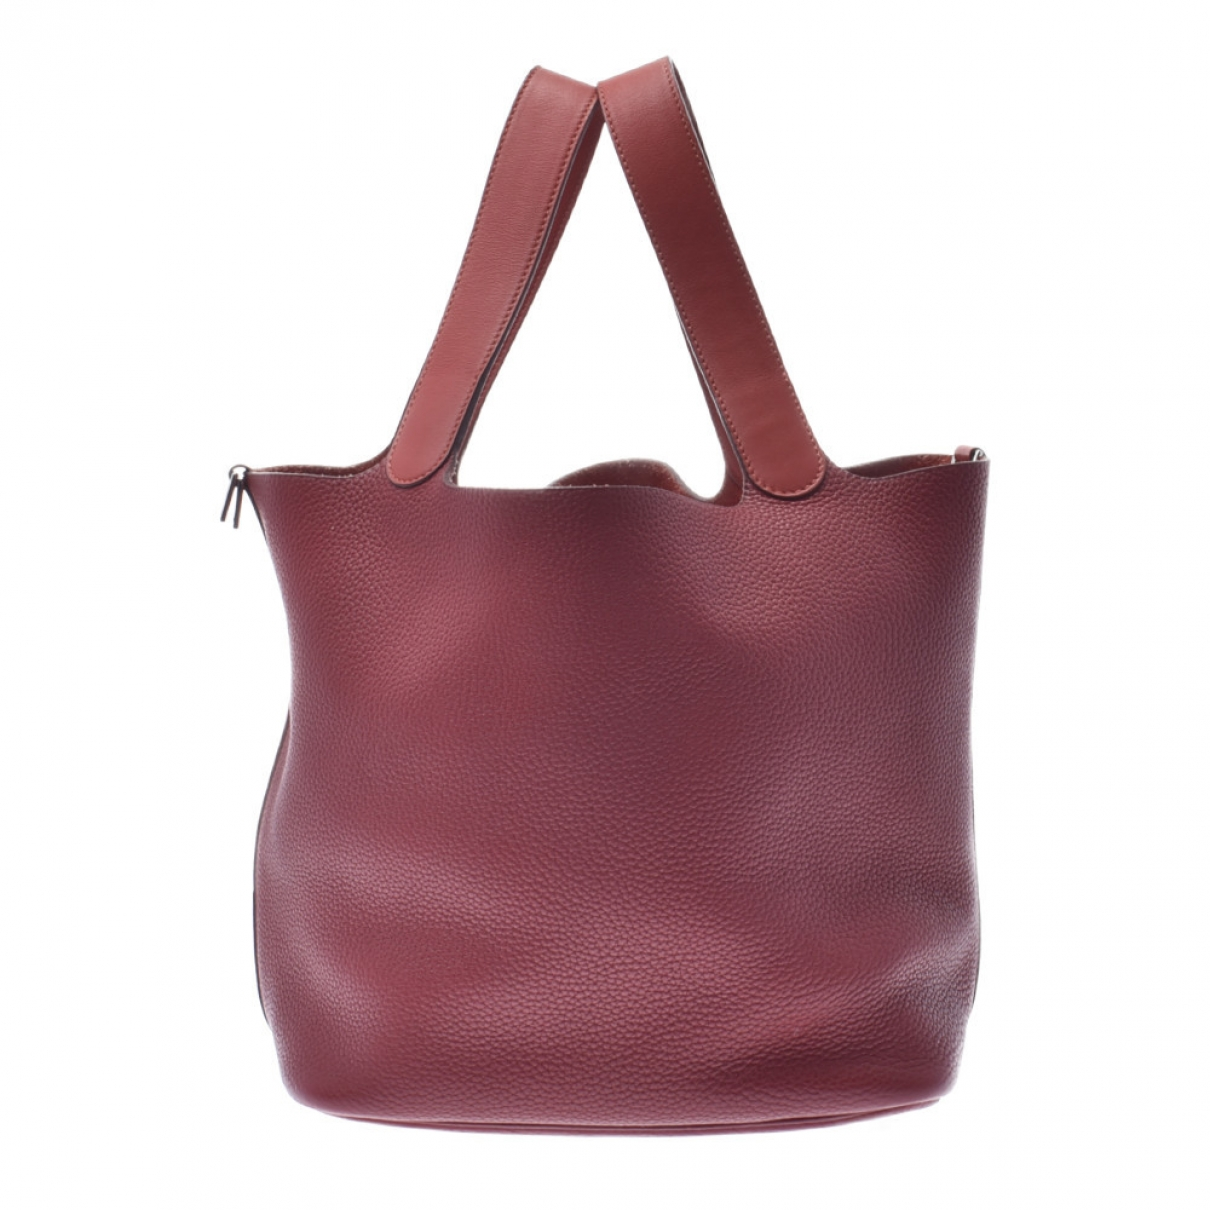 Hermès Picotin Red Leather handbag for Women \N